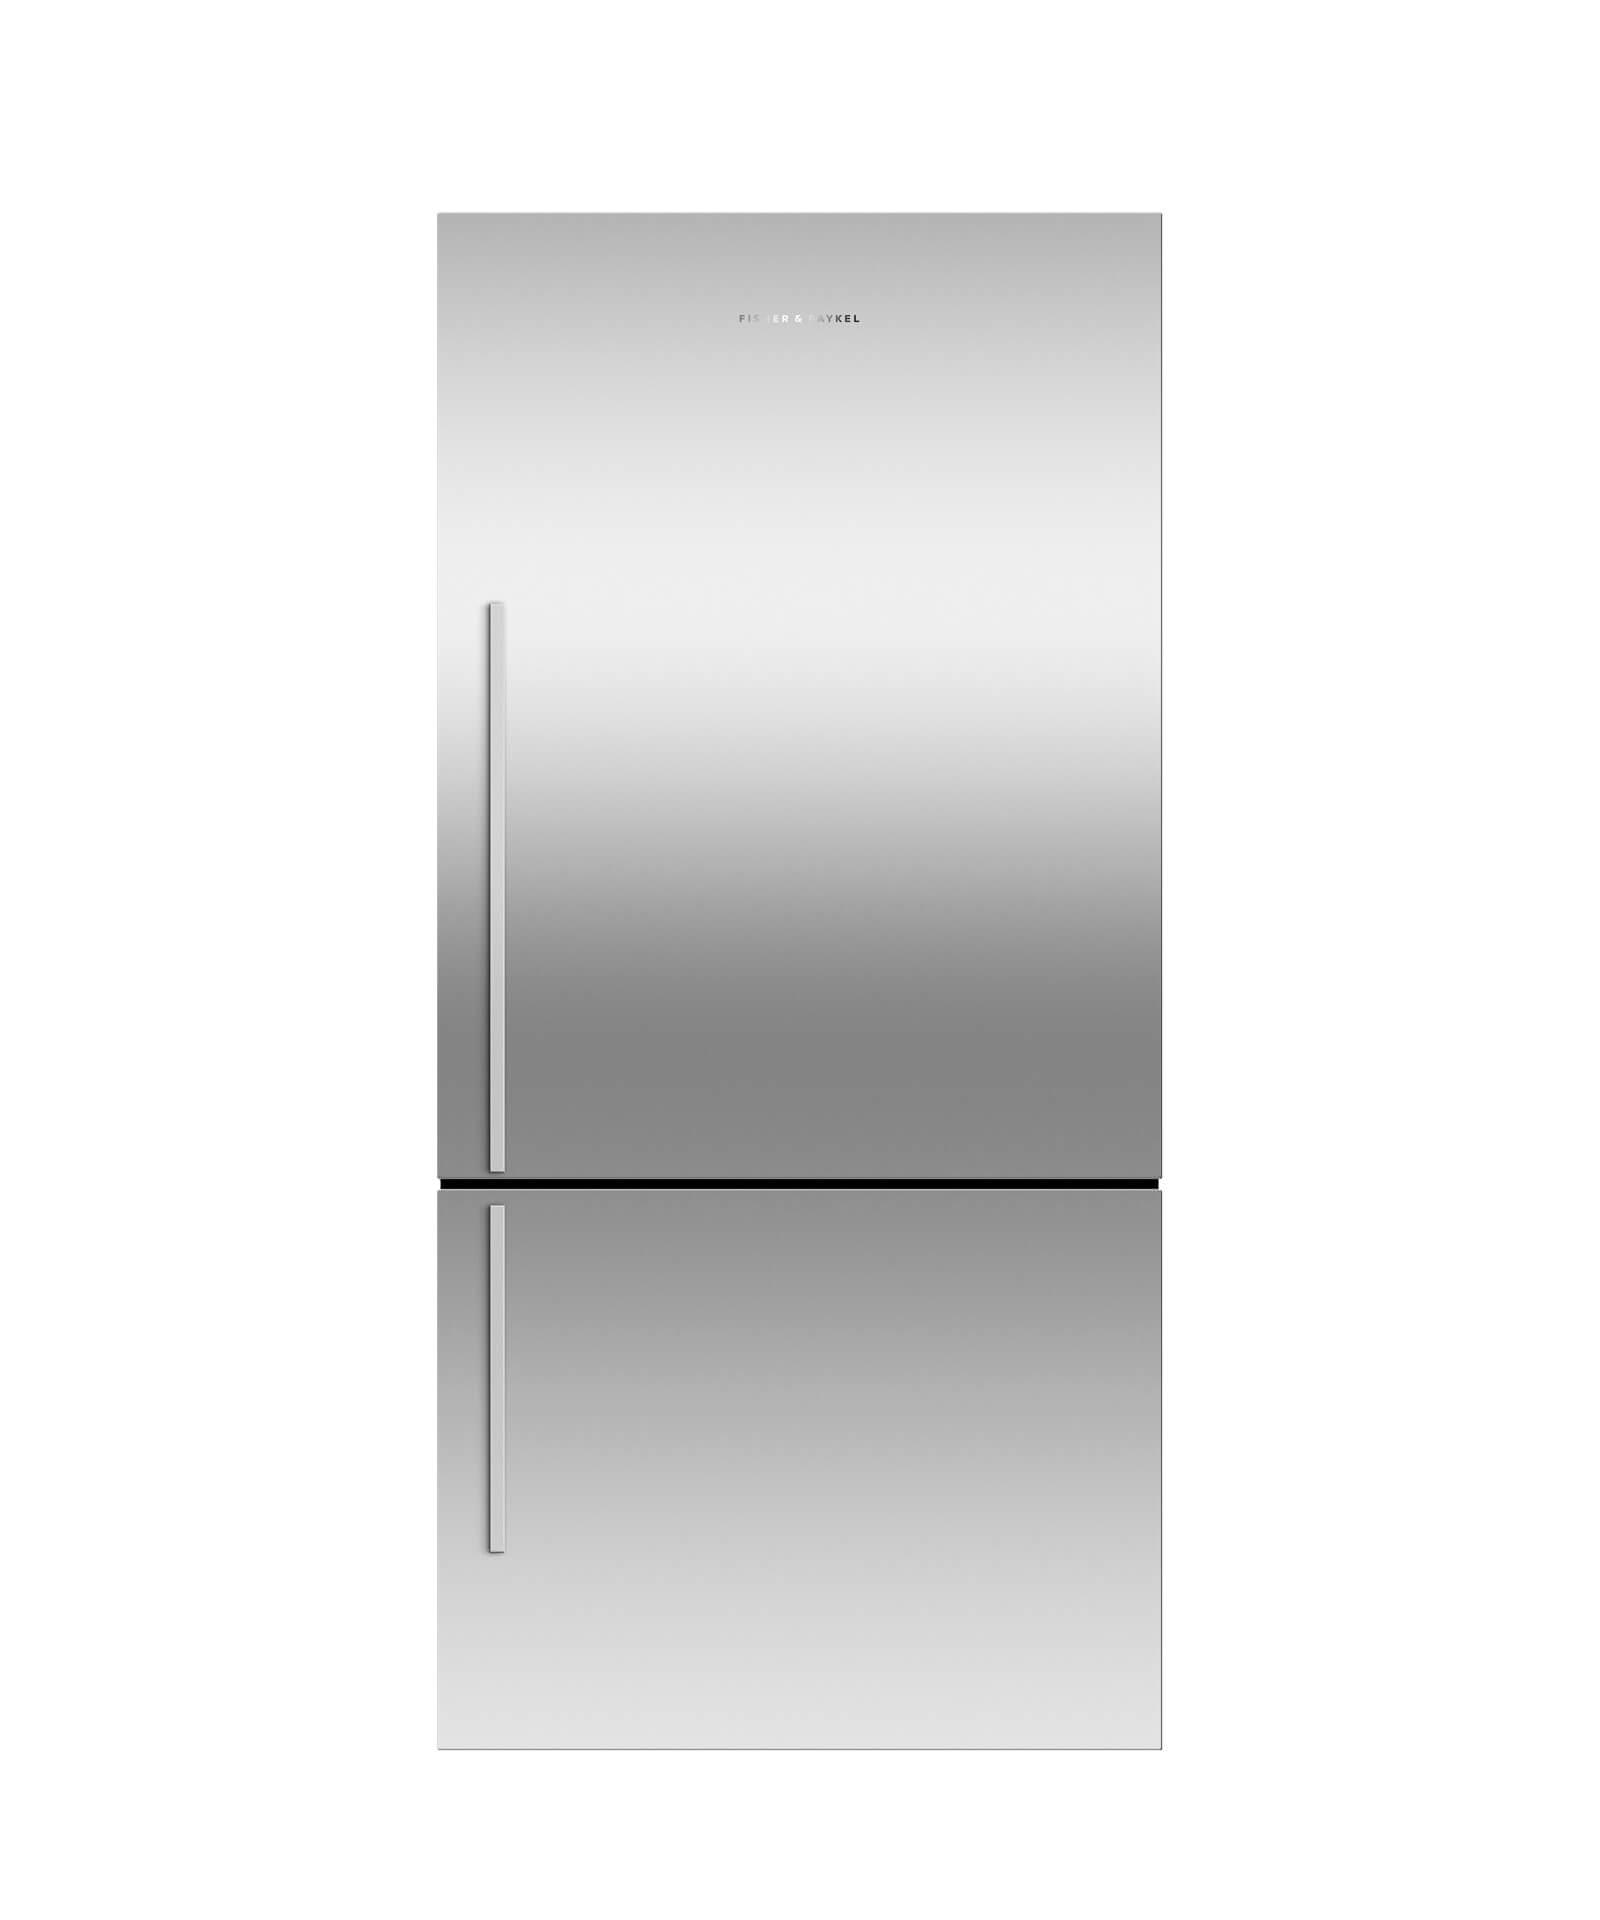 E522BRXFD5 - ActiveSmart™ Fridge - Bottom Freezer 519L - 24492